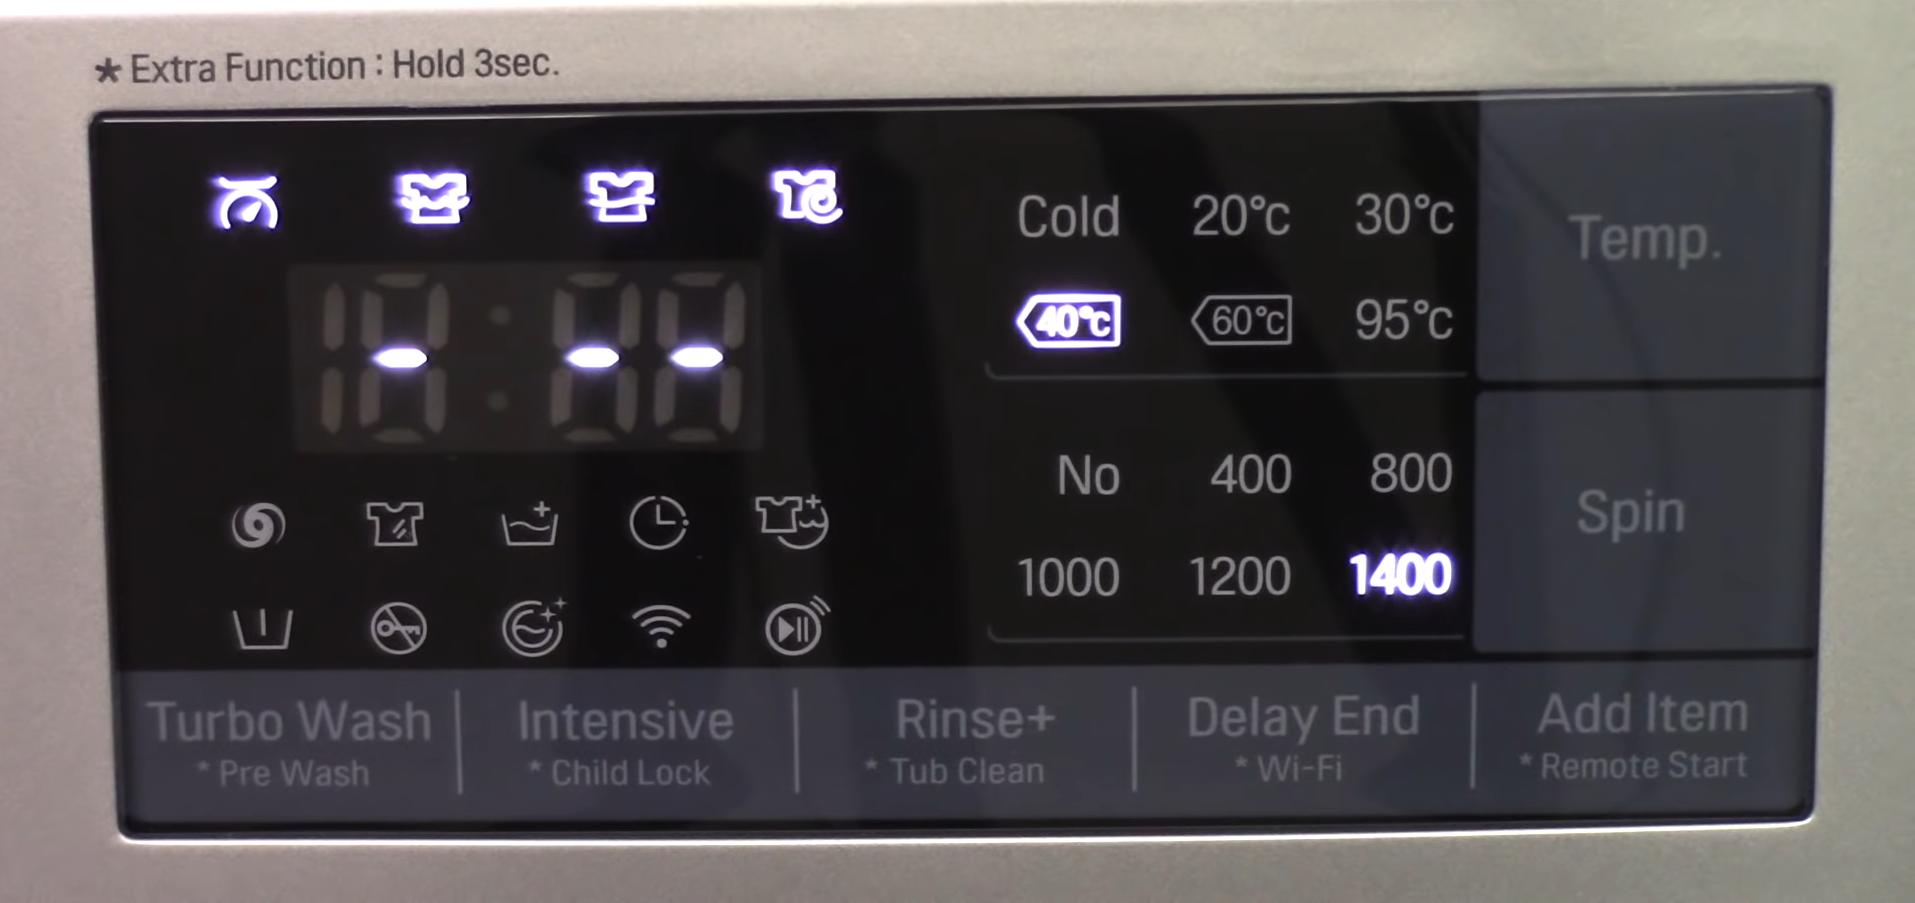 Washing Machine Hot Water Not Working In 2020 Washing Machine Bosch Washing Machine Lg Washing Machines